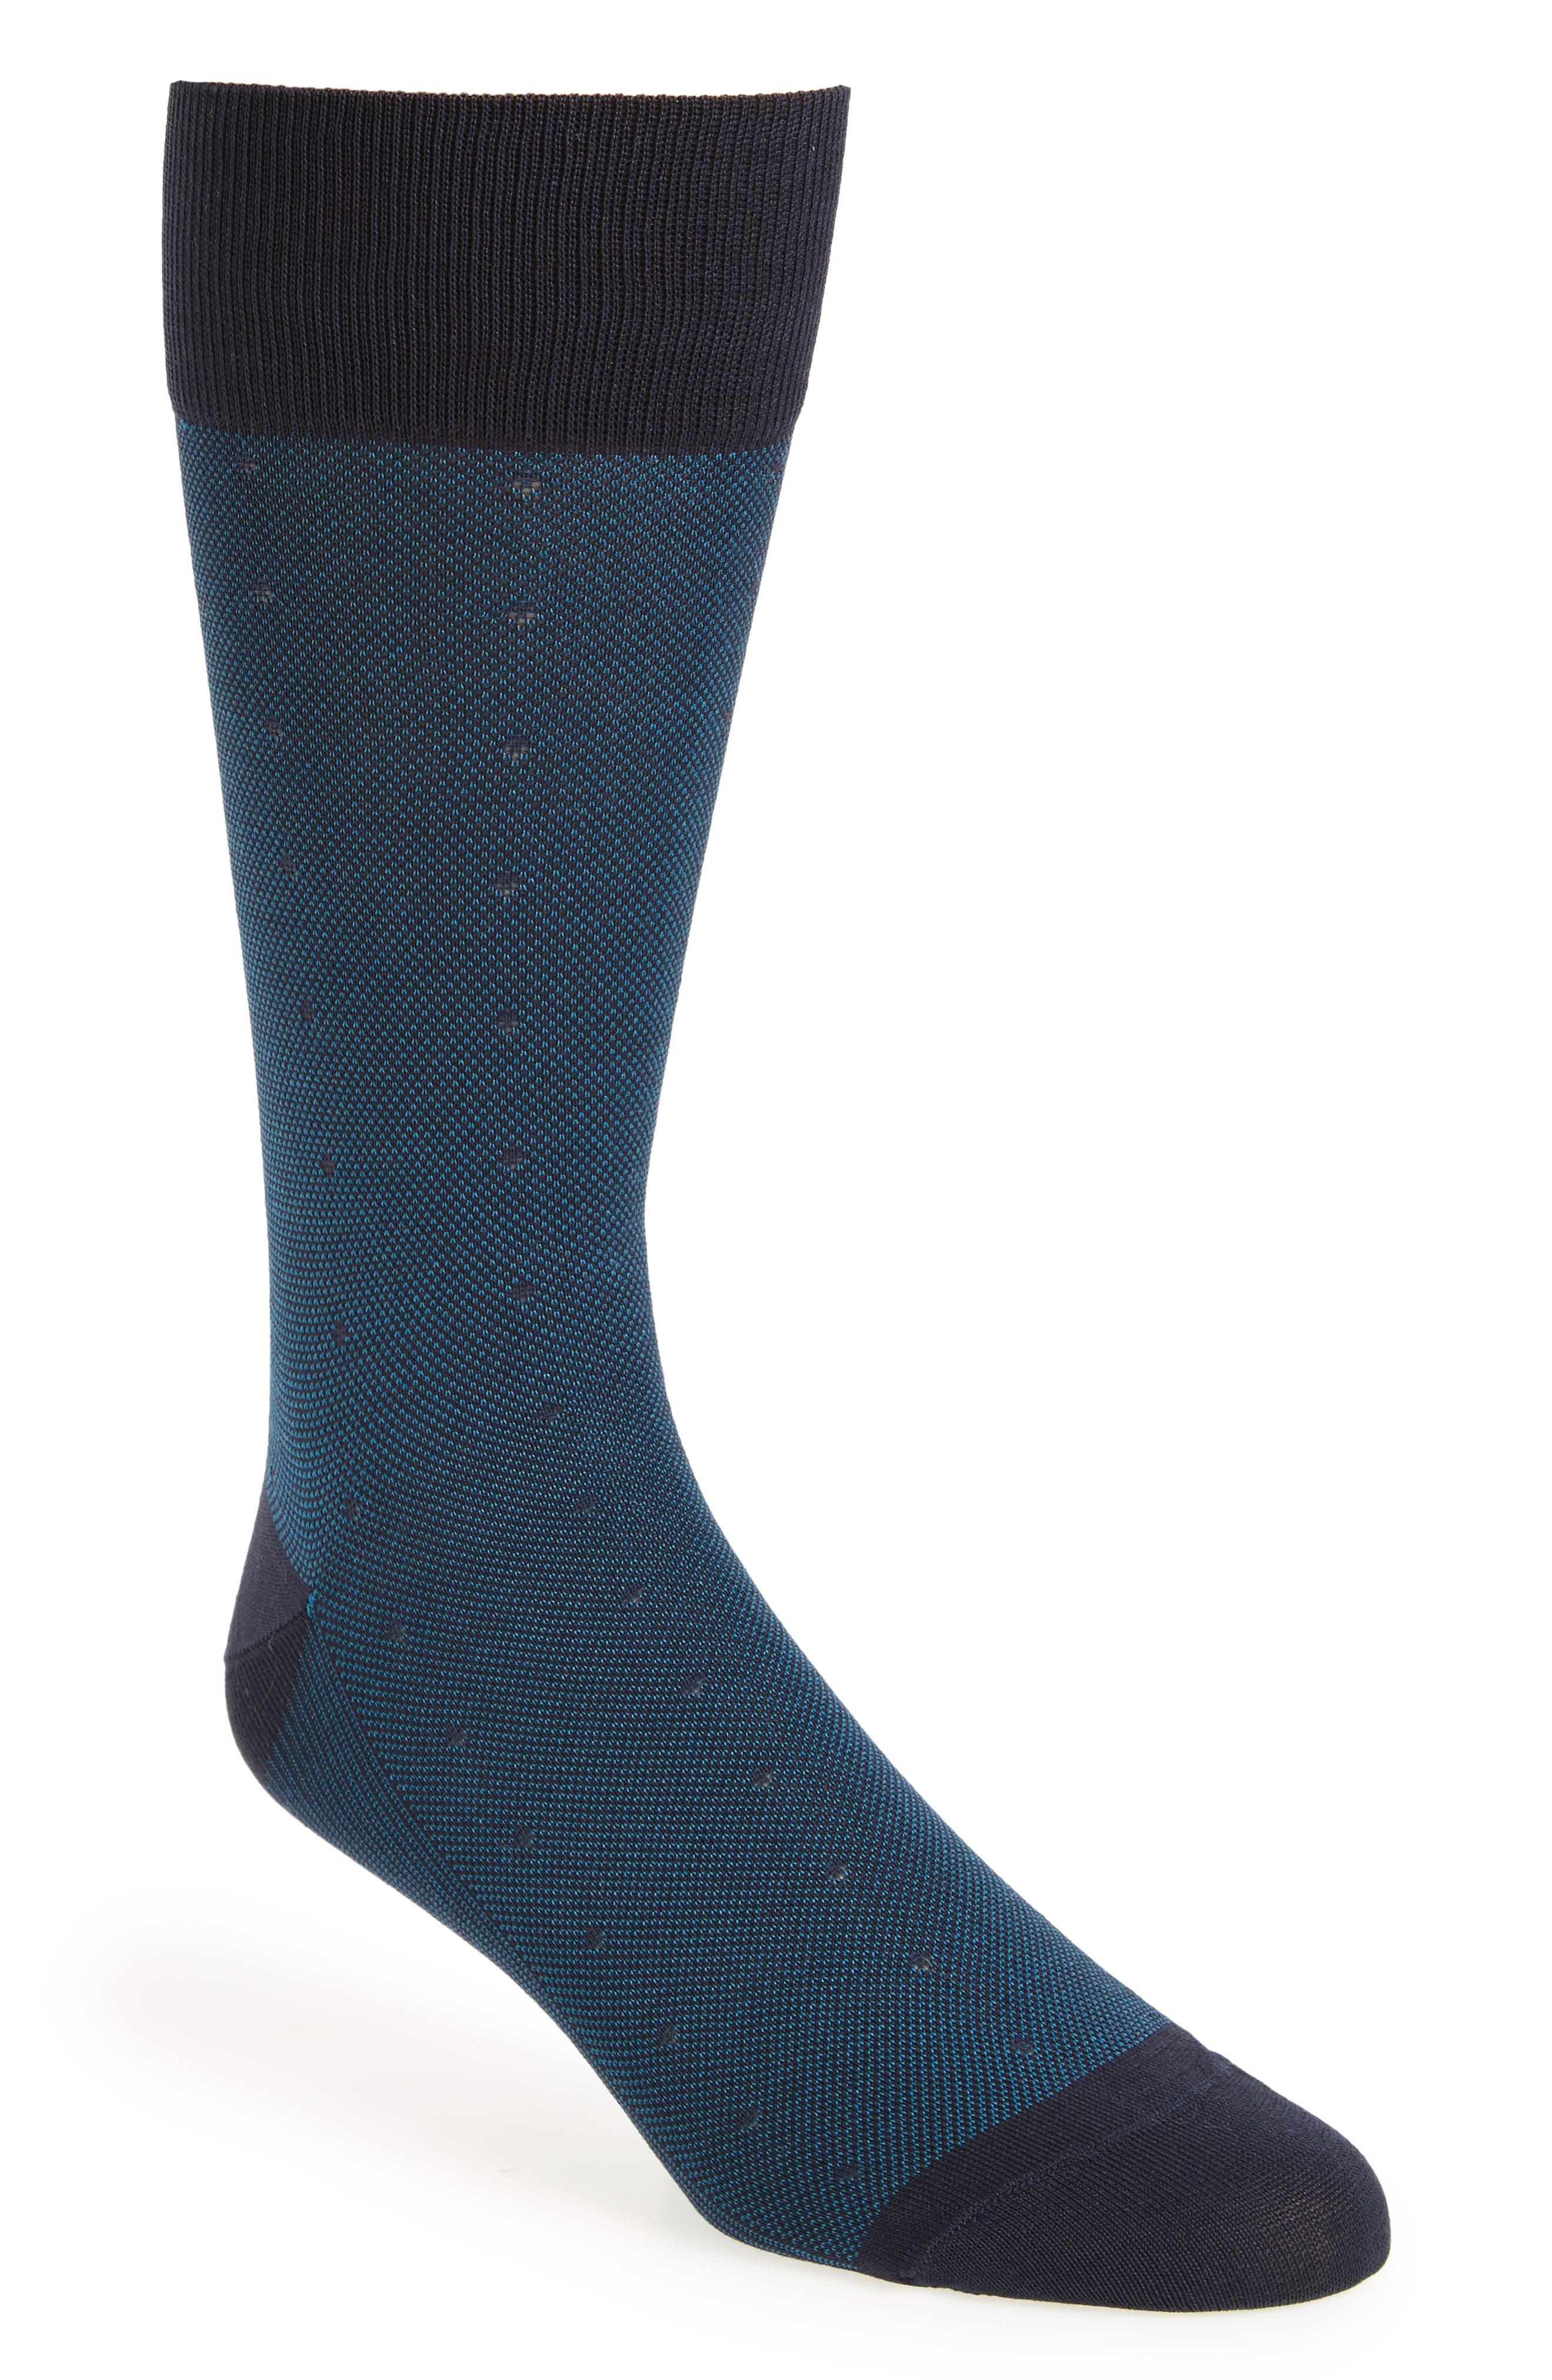 Mercerized Piqué Dot Socks,                         Main,                         color, Navy/ Blue